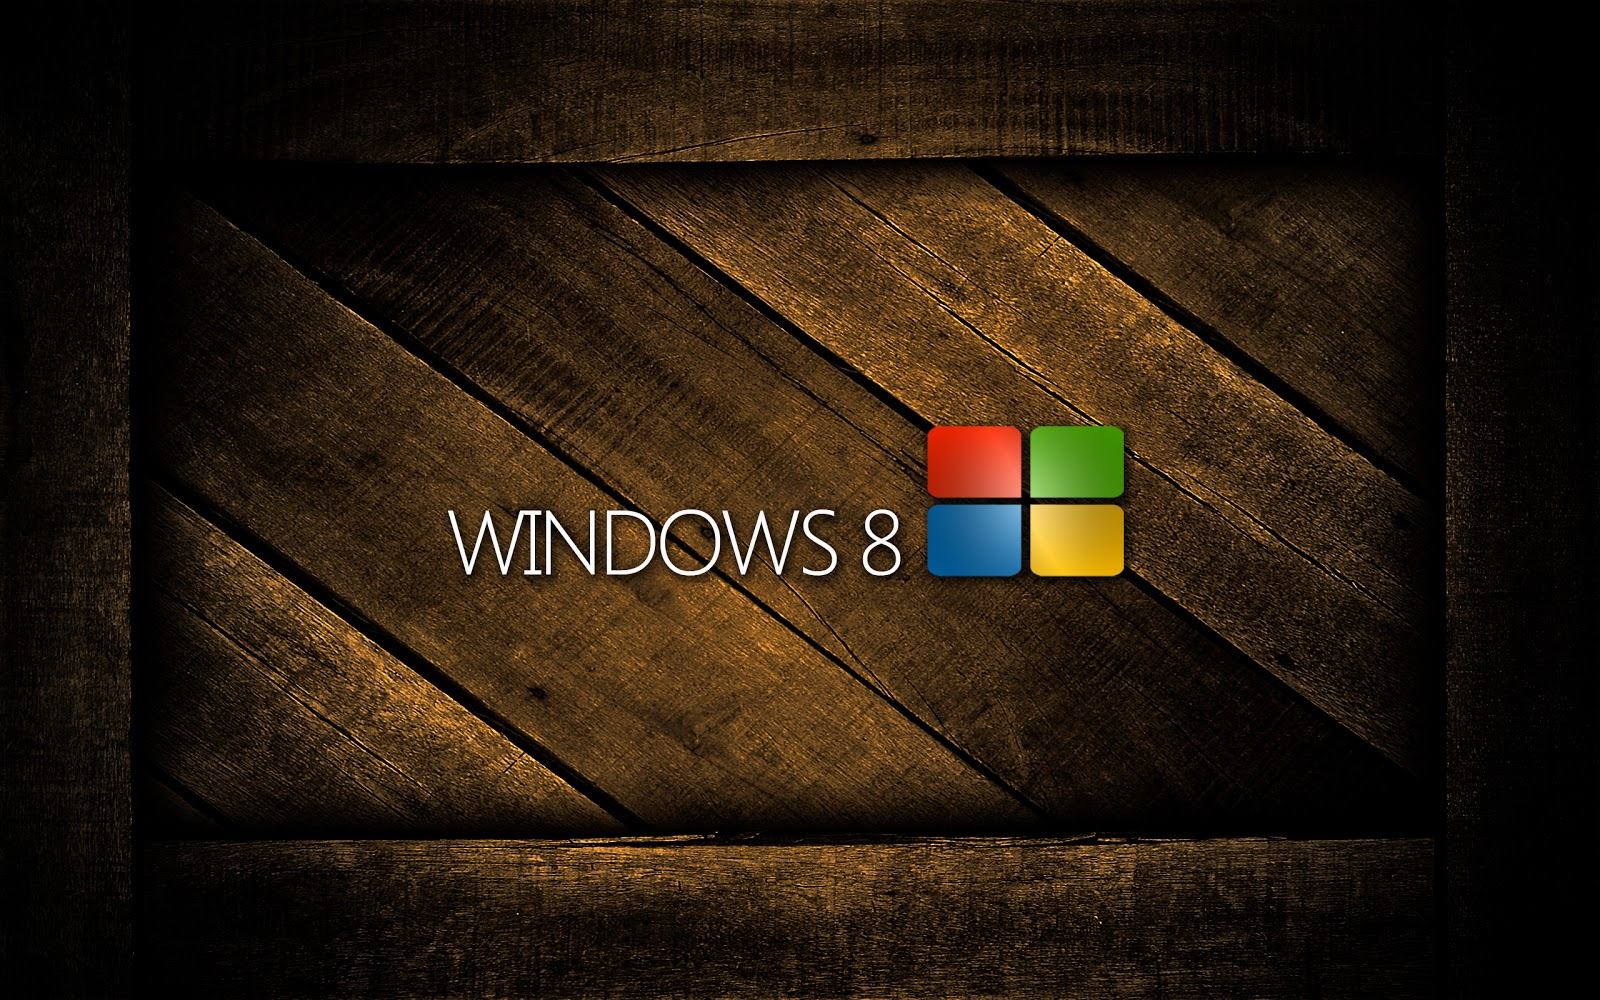 Windows Wallpaper X